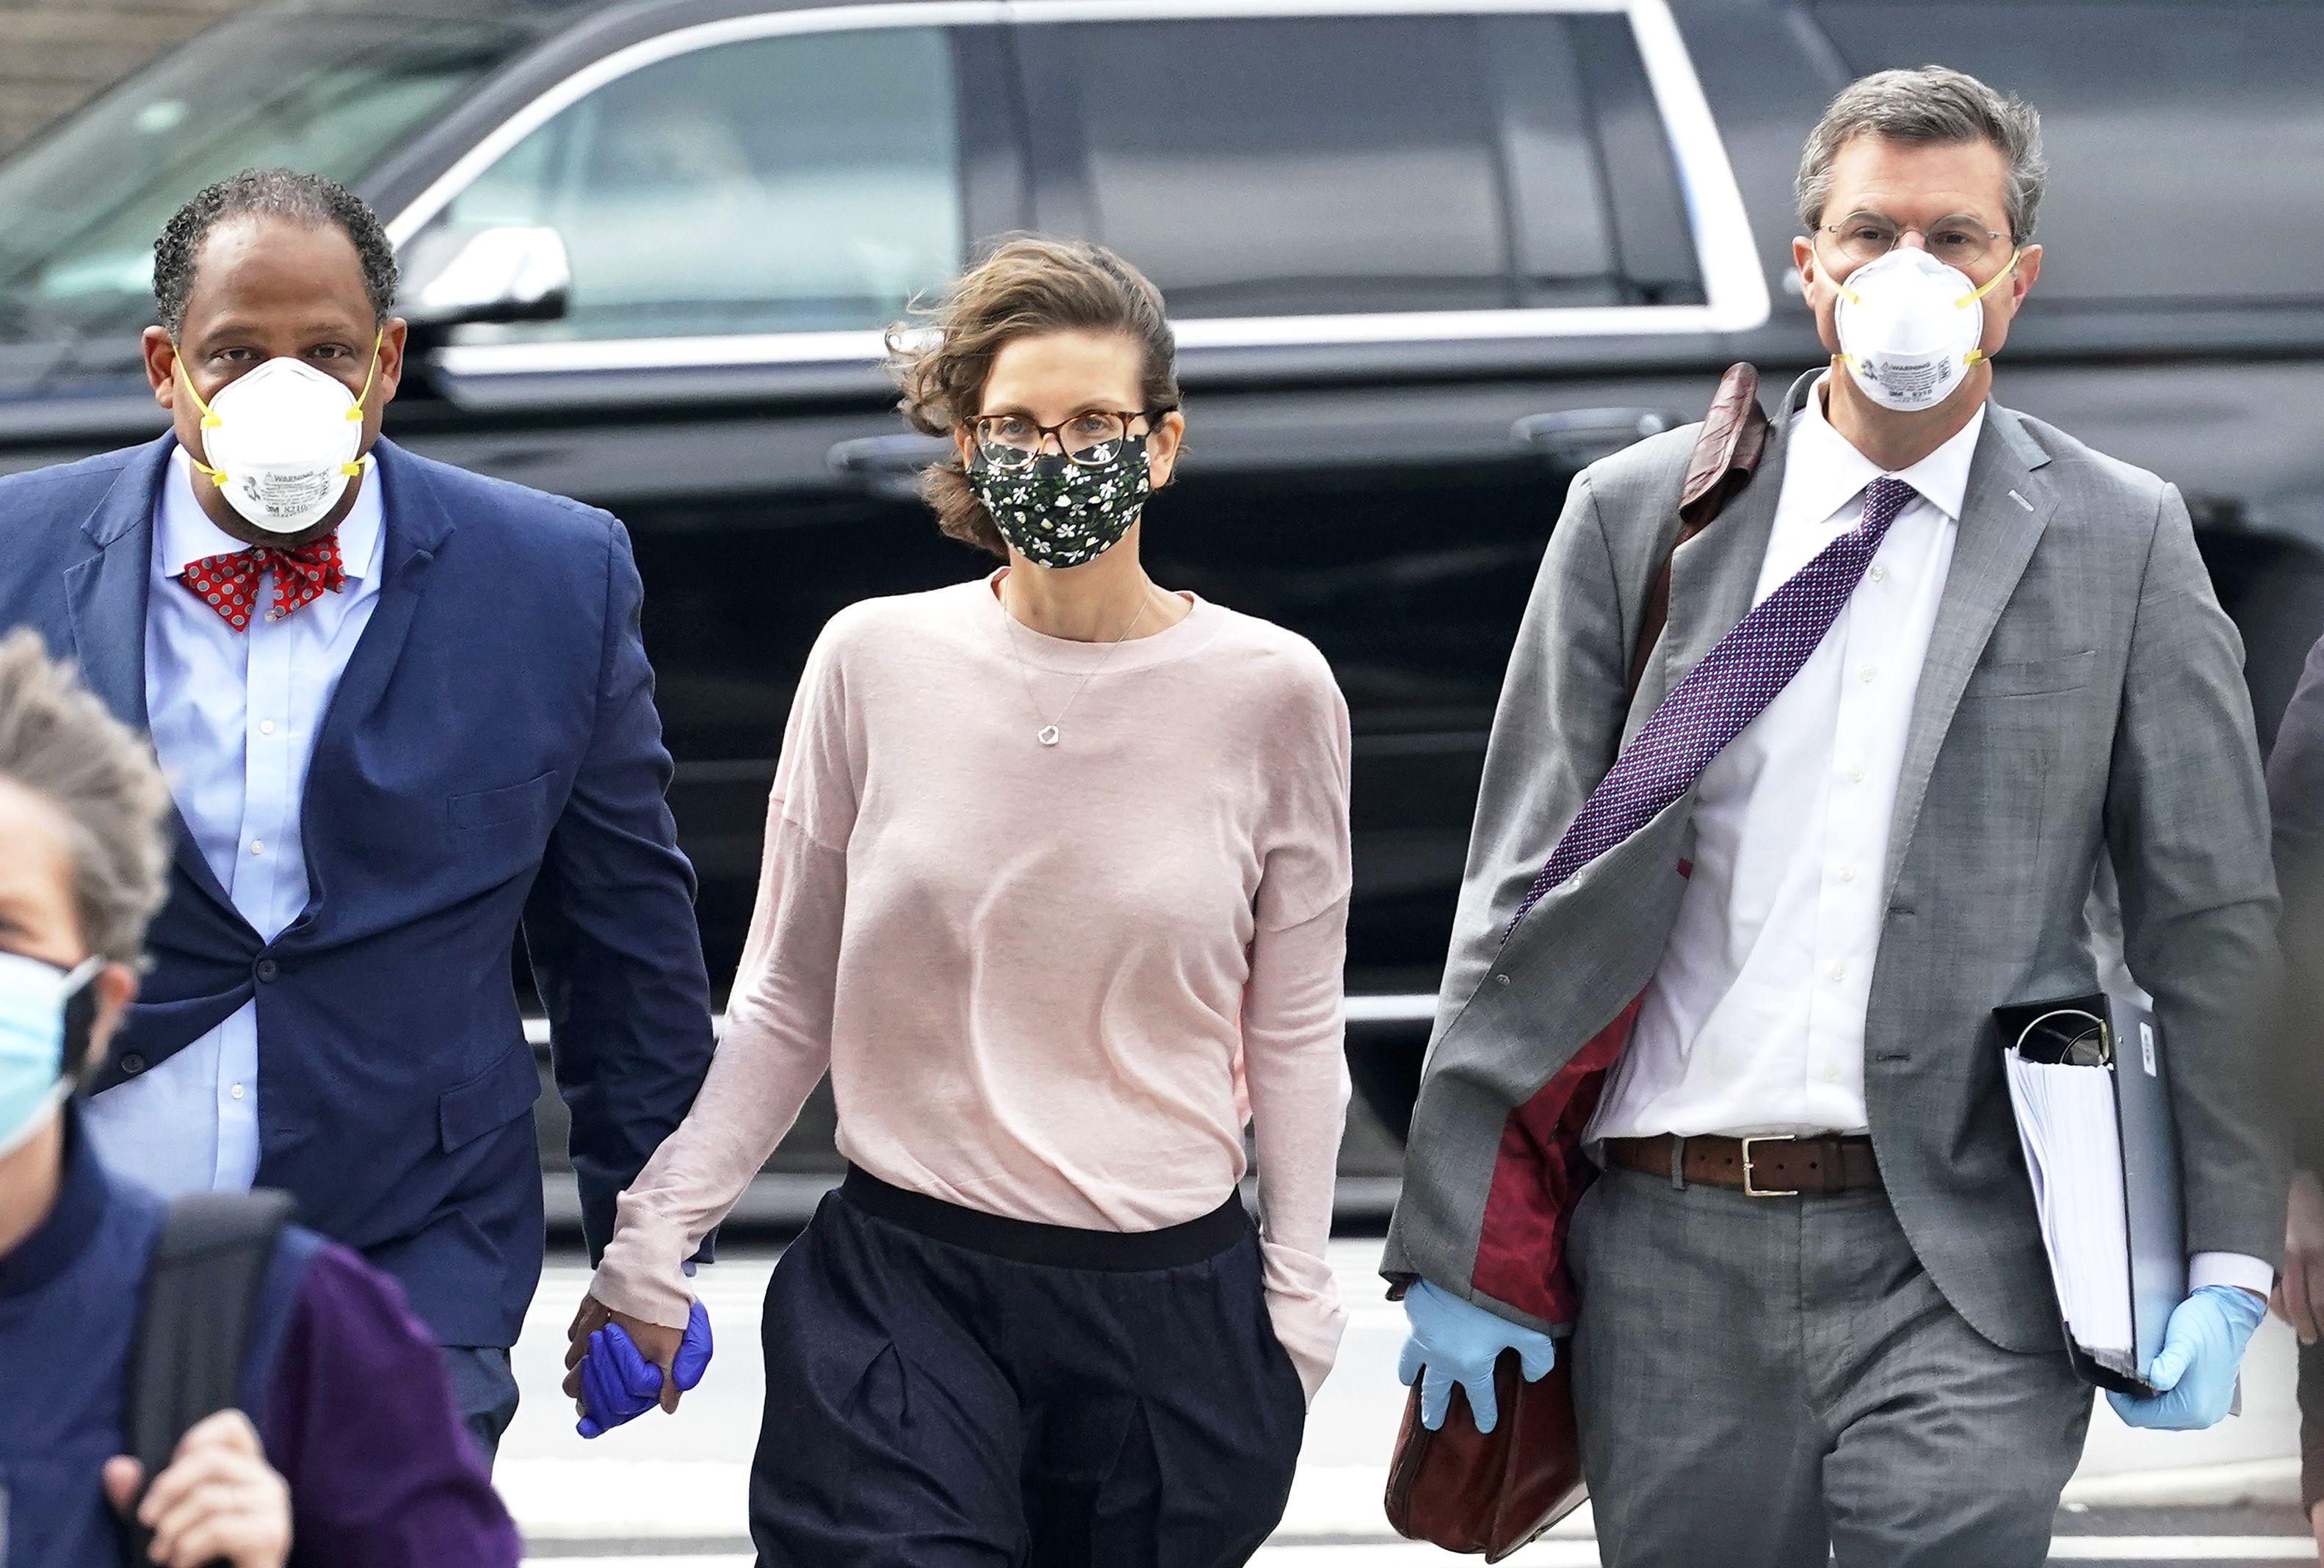 clare bronfman seagram heiress sentenced to 81 months in prison in nxivm trial